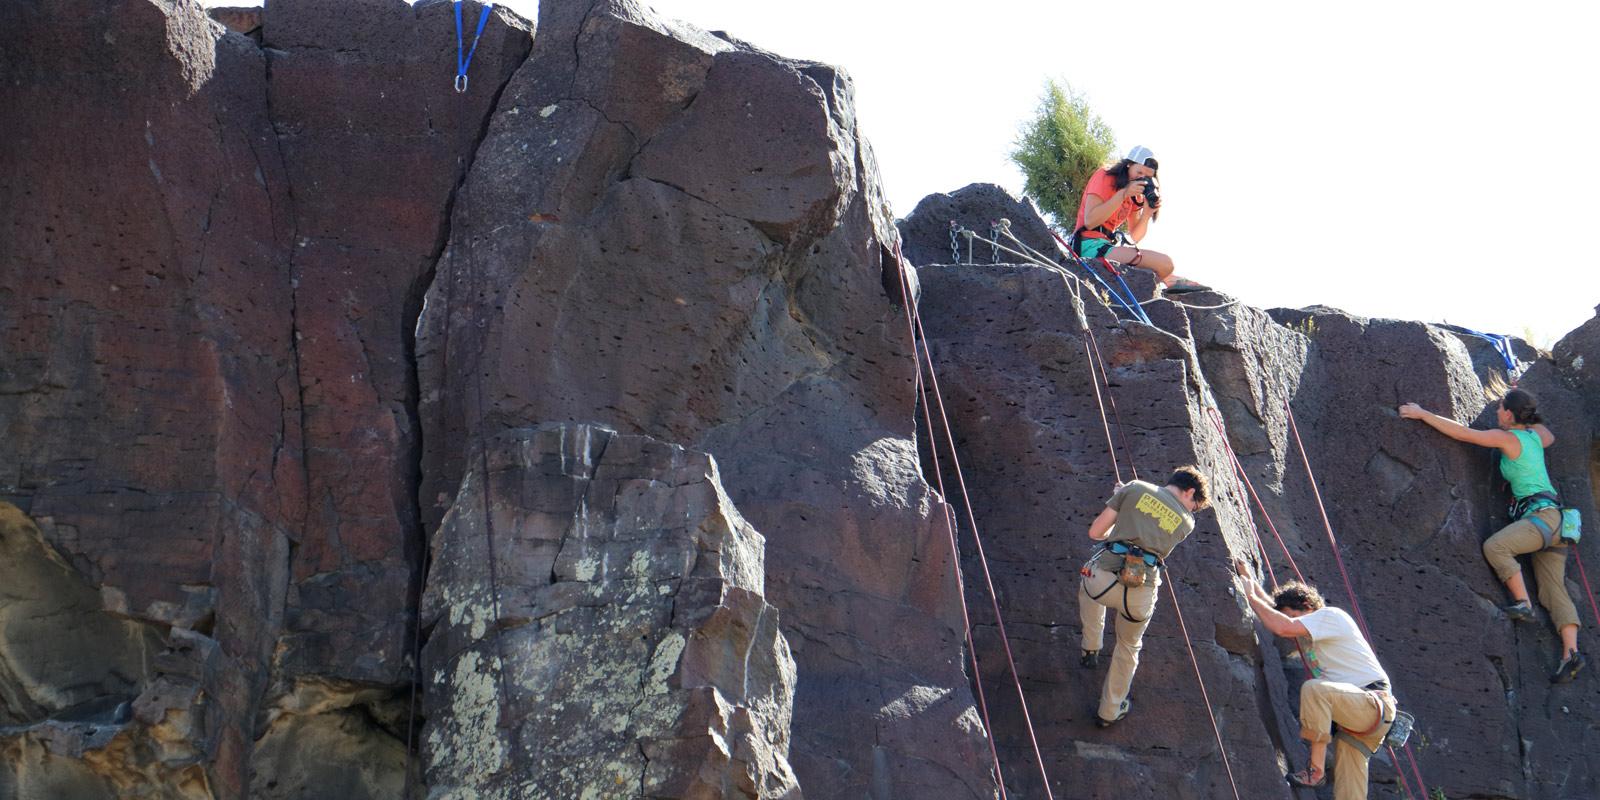 image: Pocatello Pump climbers